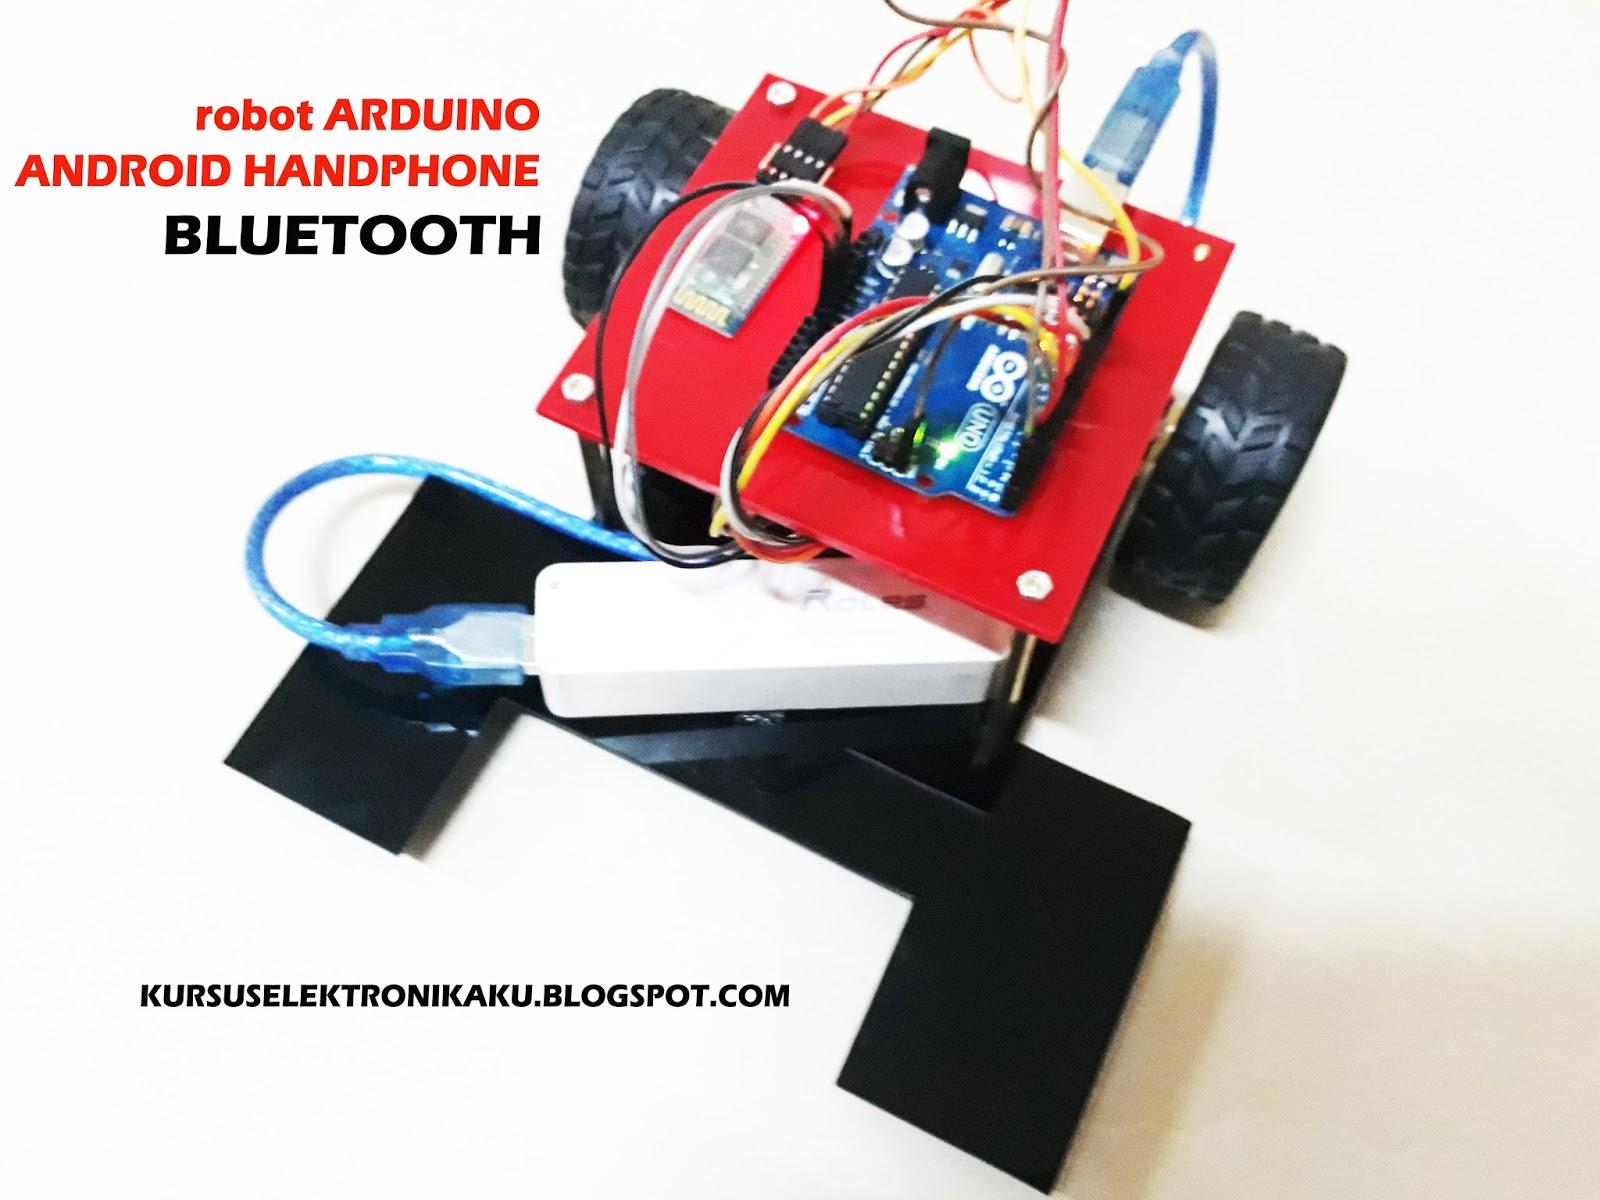 Membuat Robot Kendali Android Handphone via Bluetooth ARDUINO 2018 09 15 23 27 04